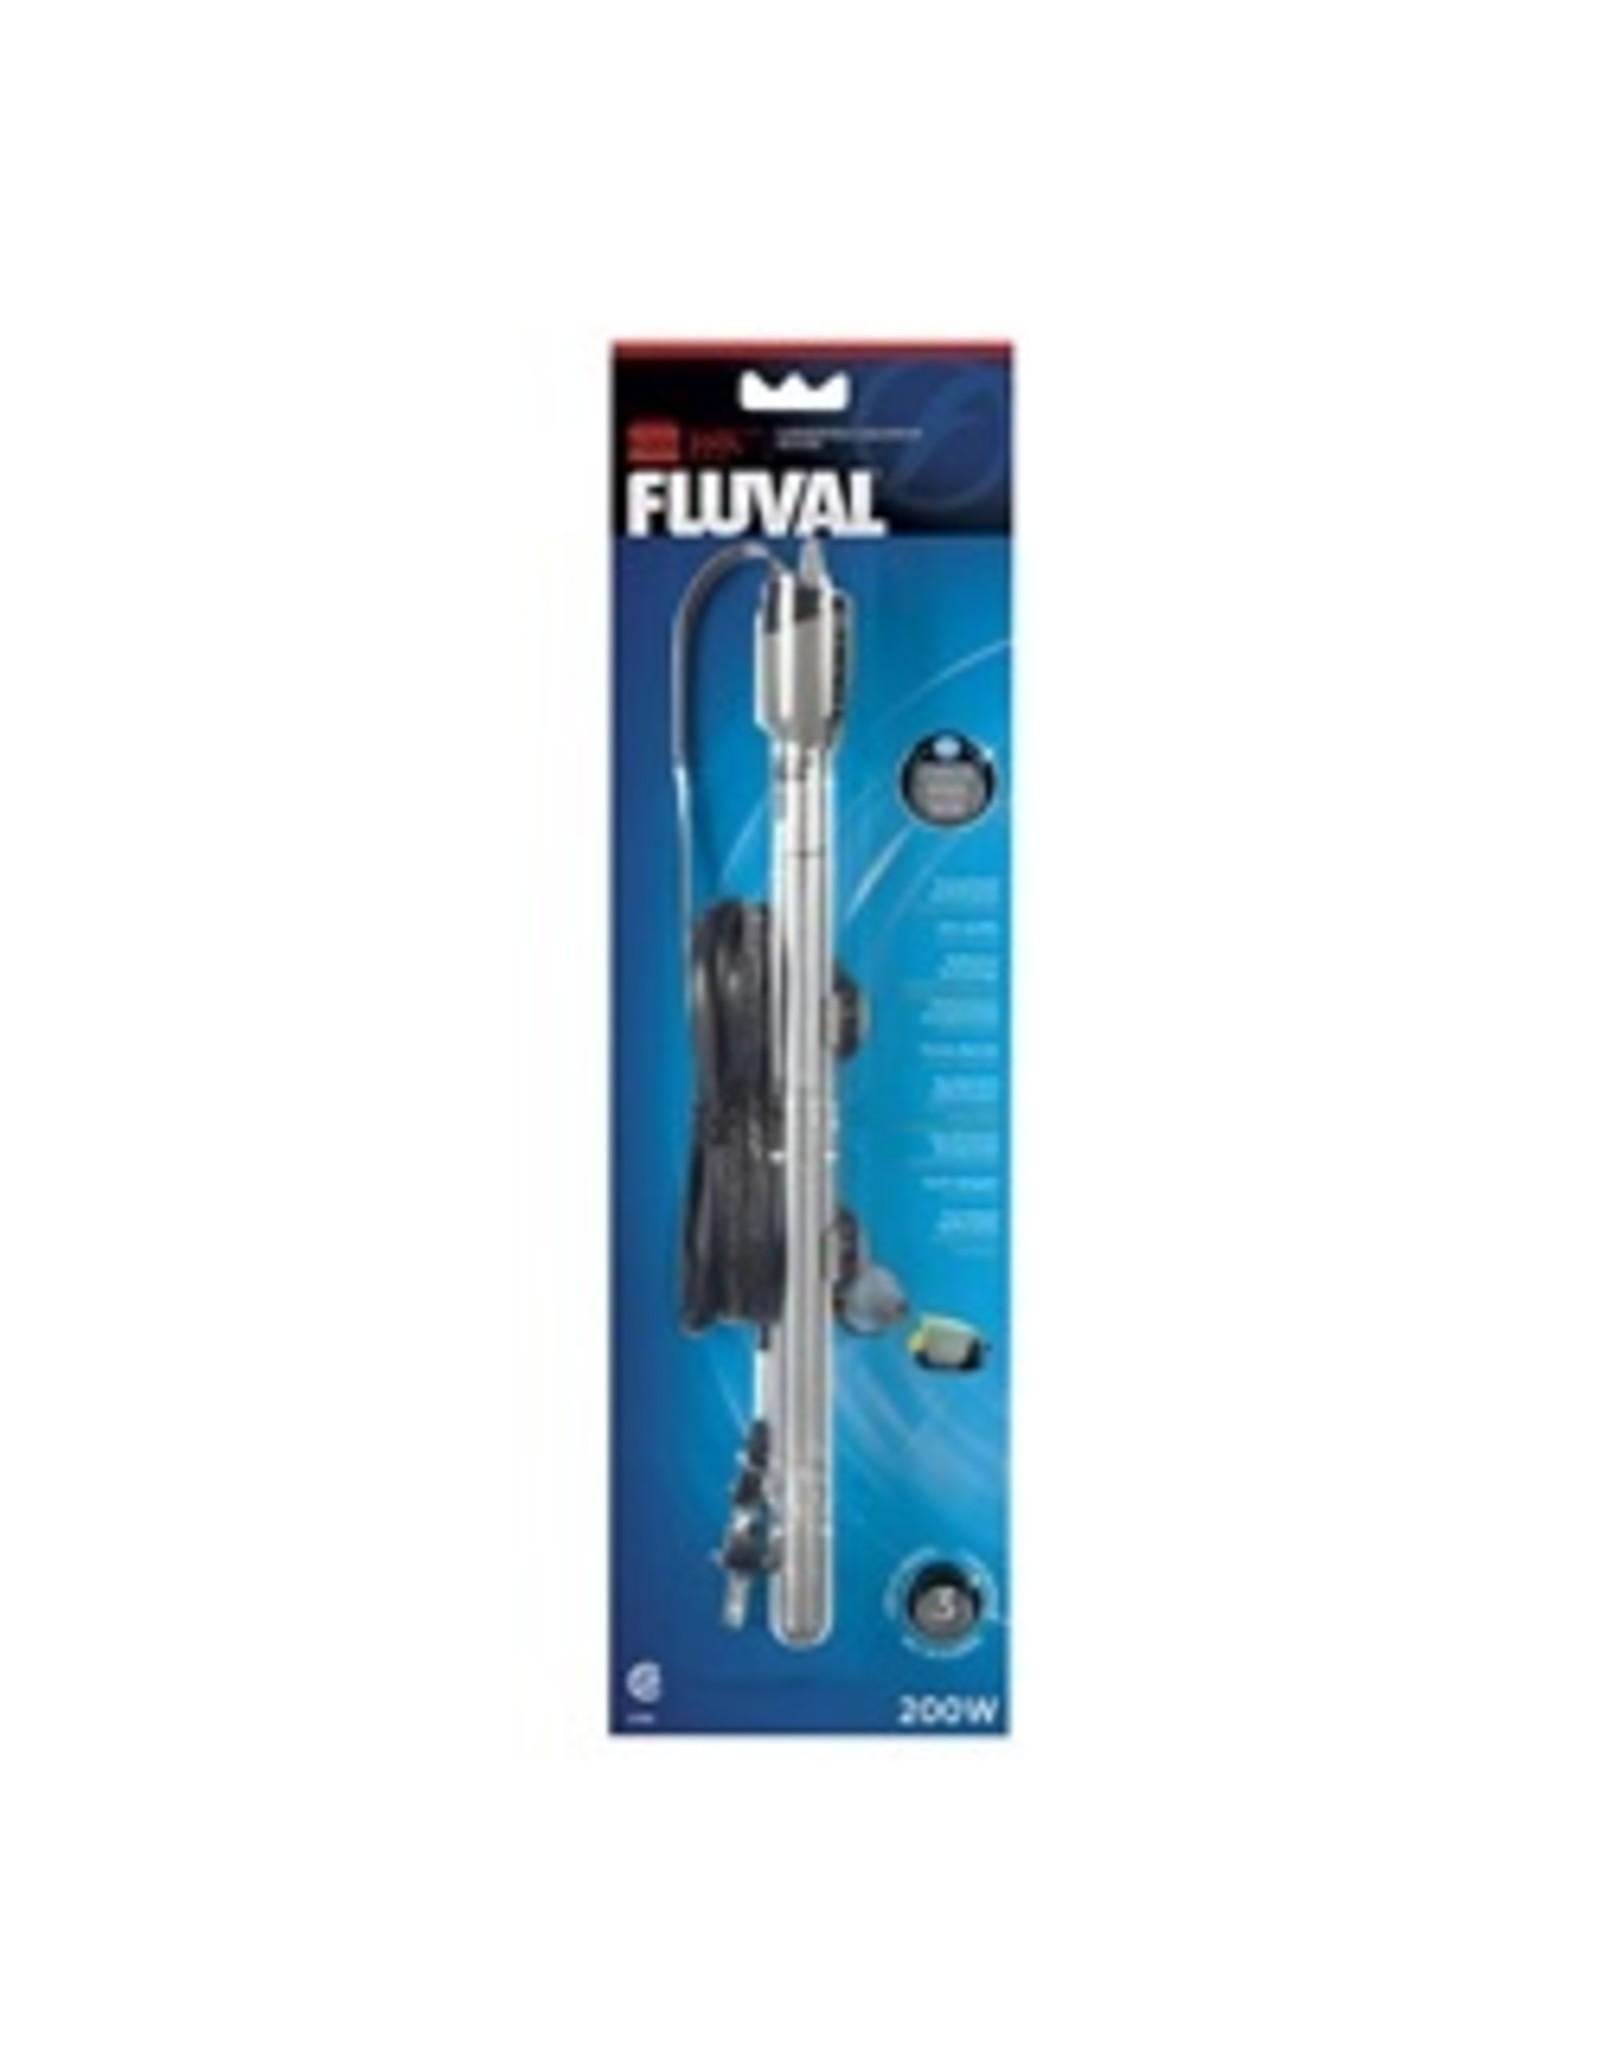 FL - Fluval Fluval M Prem. Aquarium Heater 200 Watt